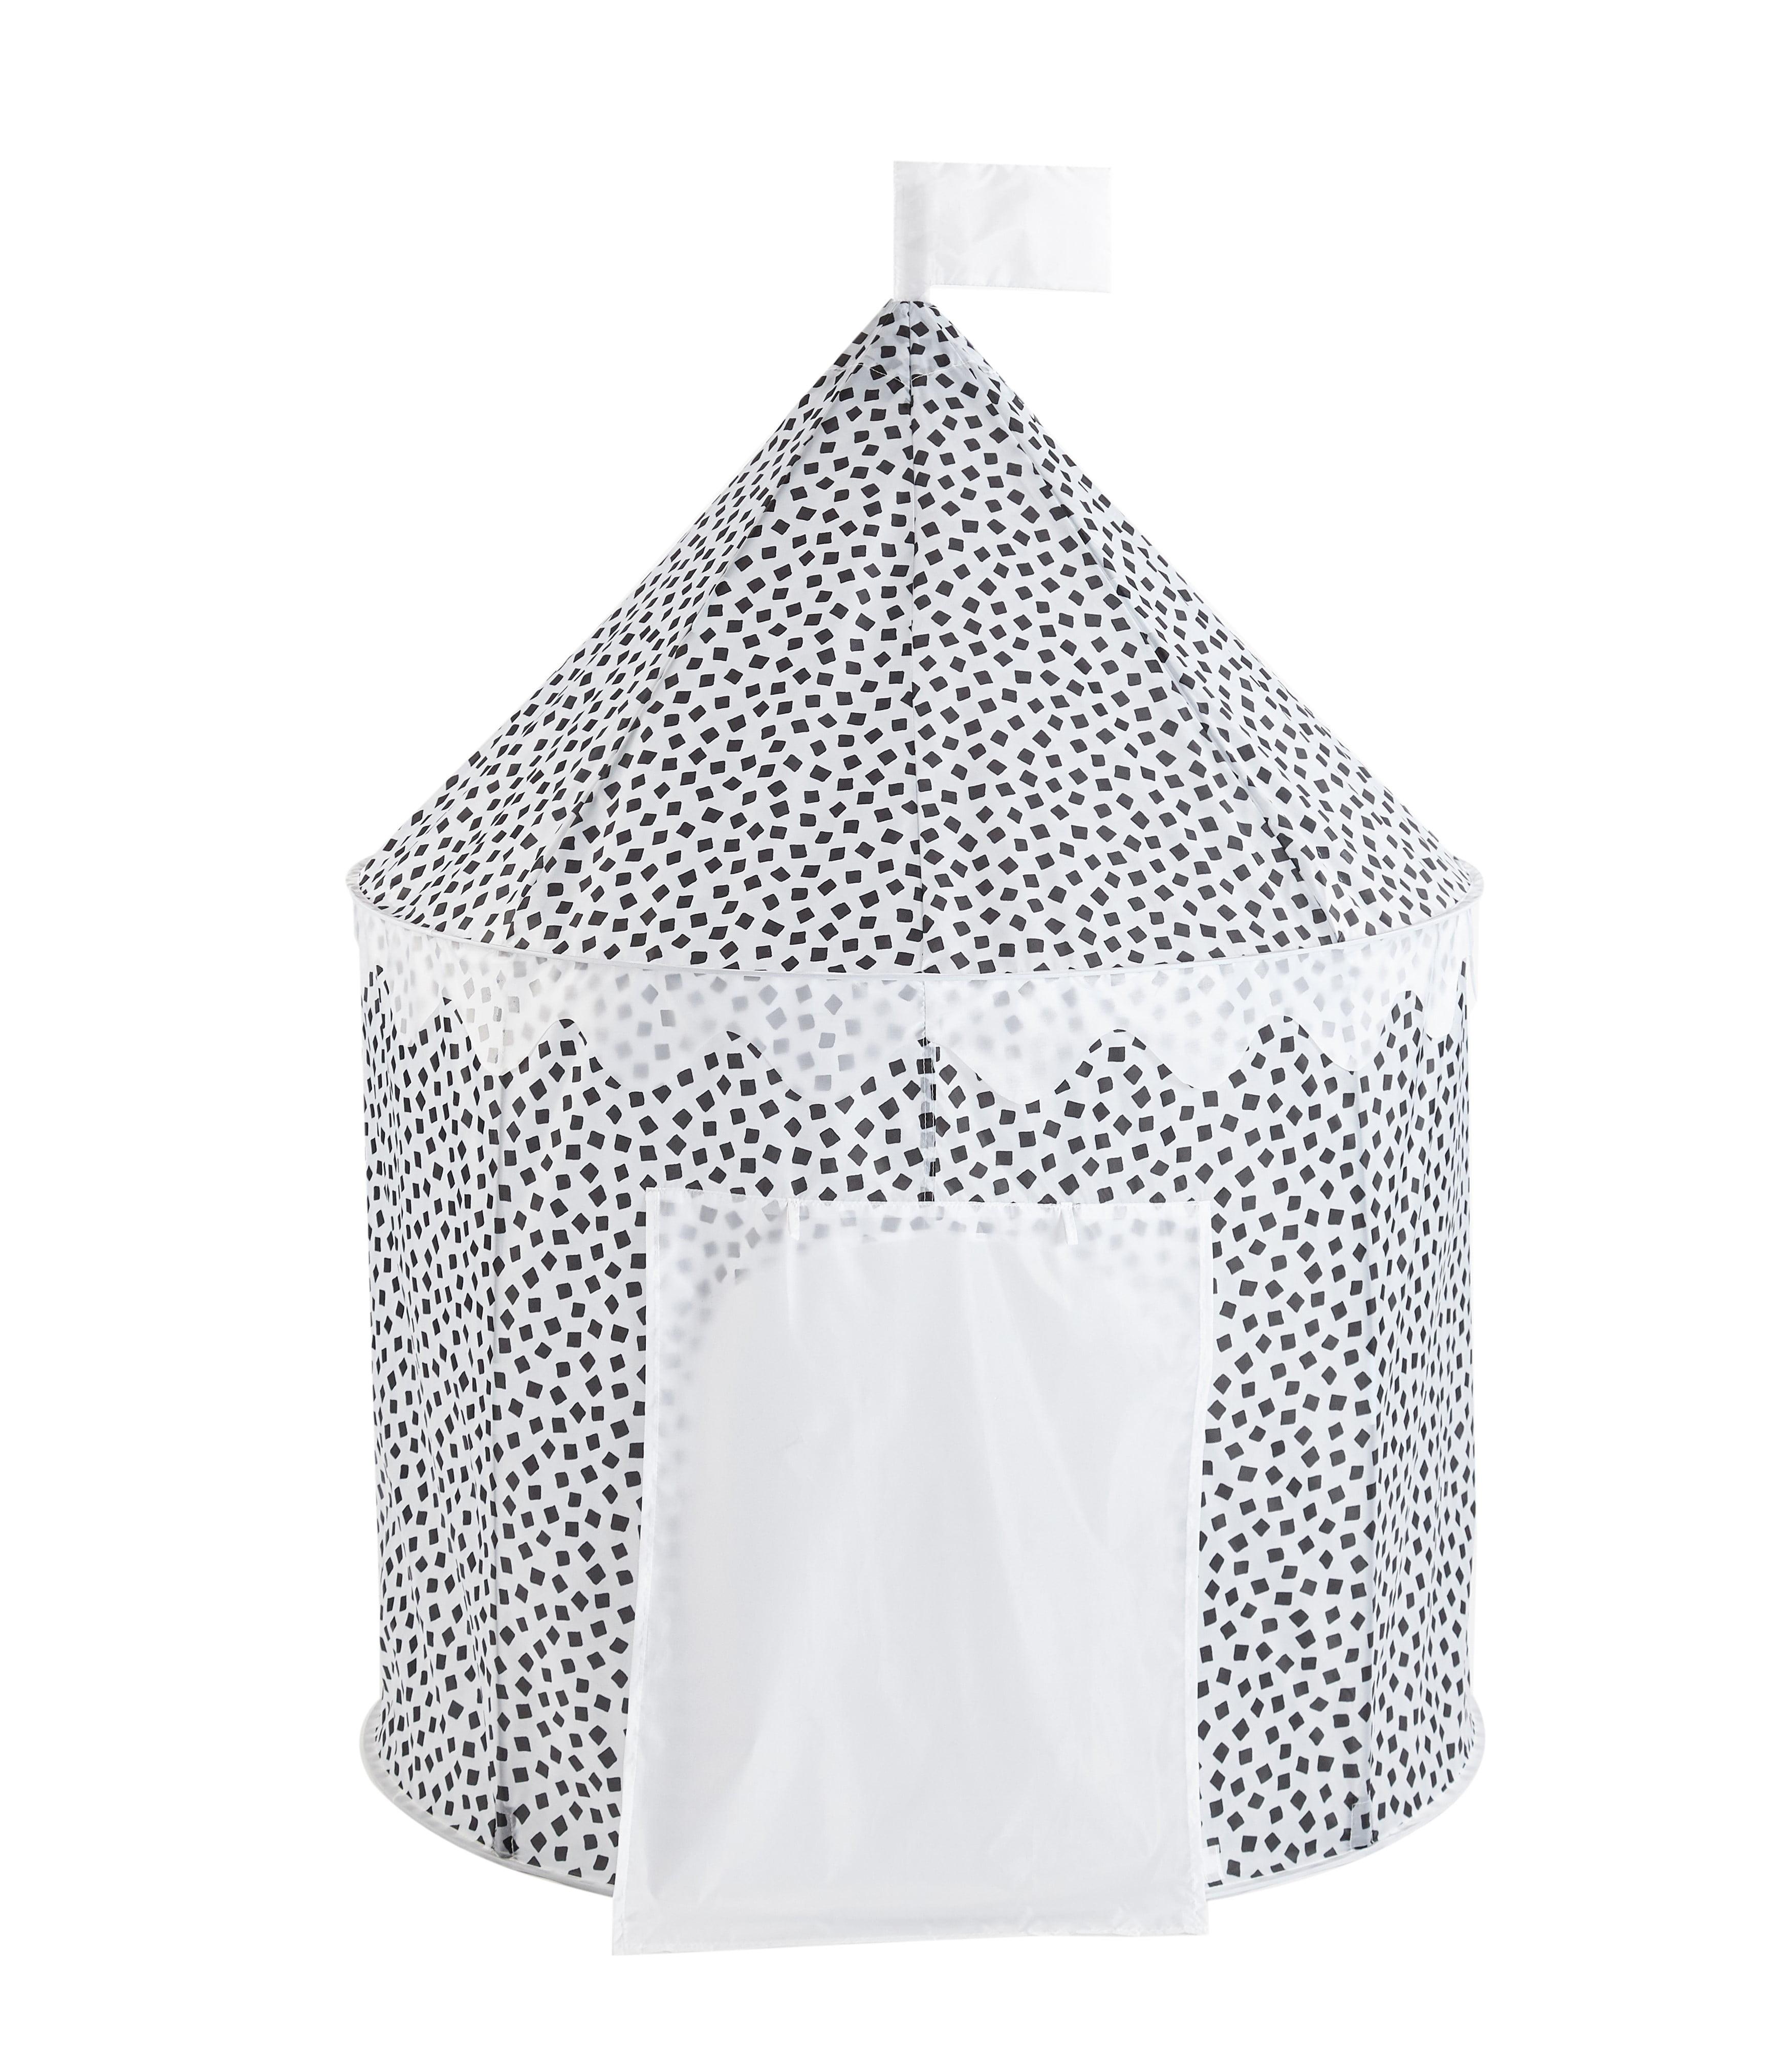 Mainstays Circular Kids Play Tent, Confetti